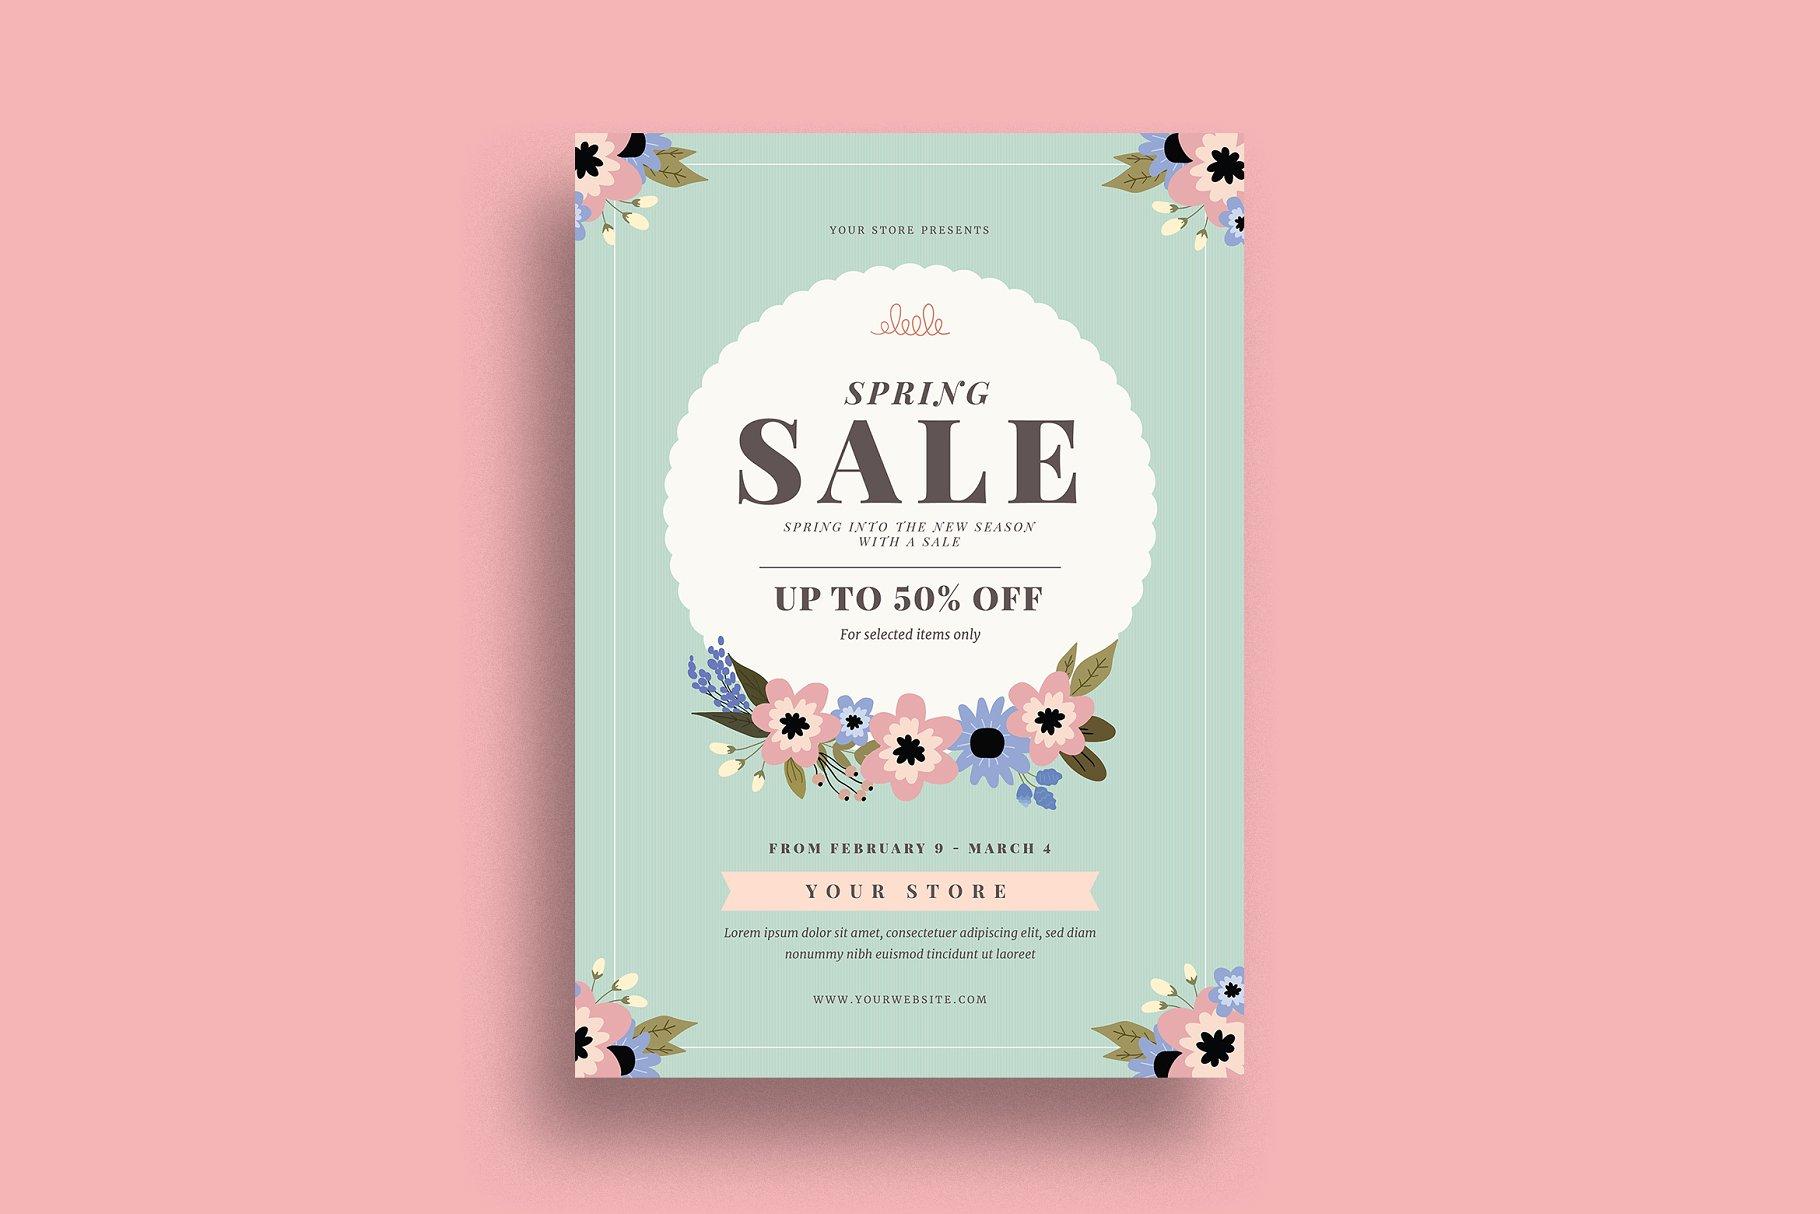 Spring Sale Event Flyer Flyer Templates Creative Market Pro